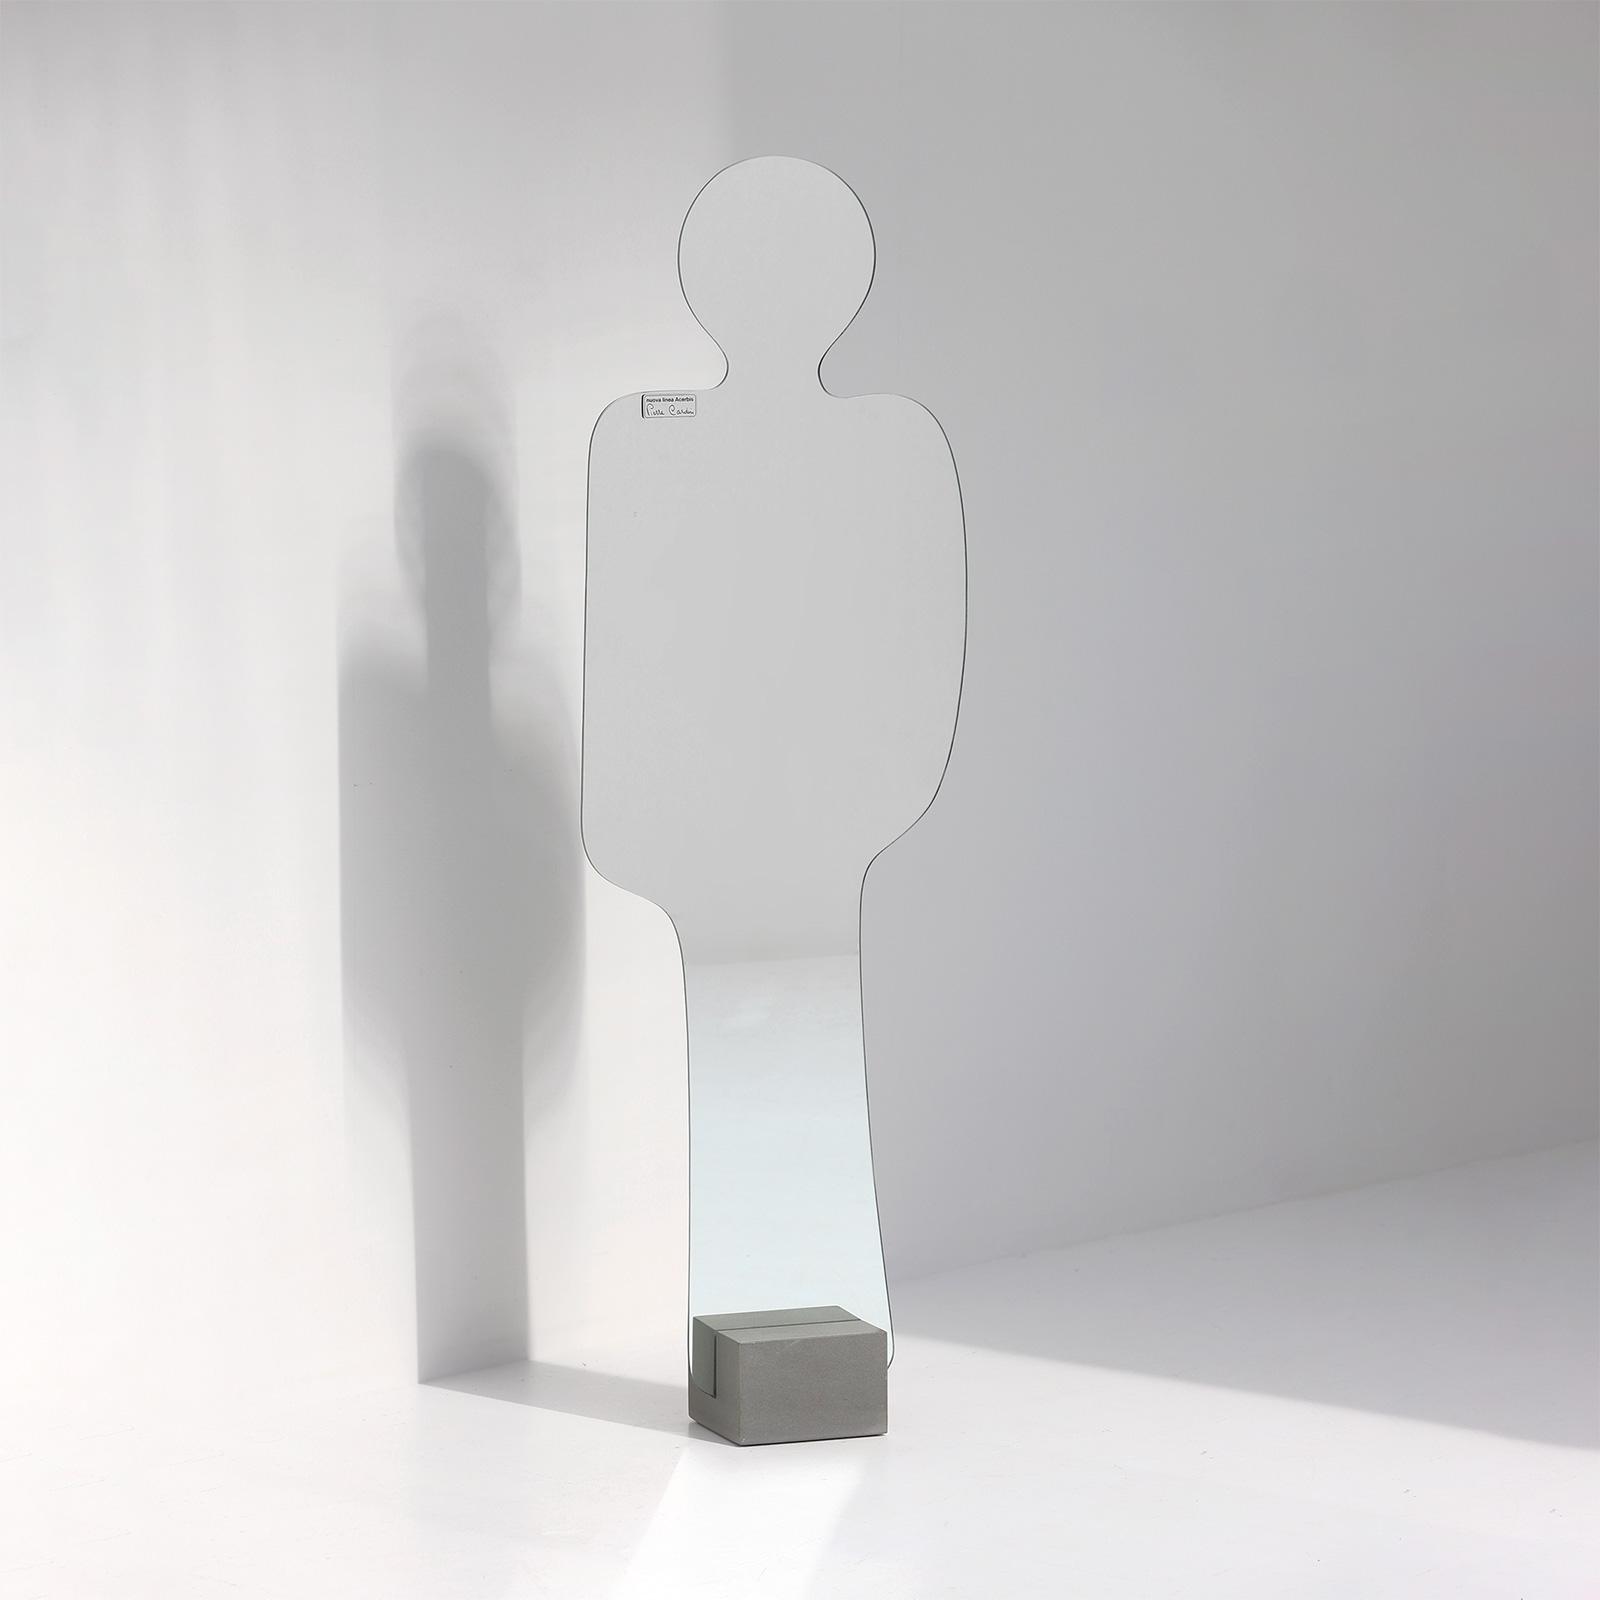 Pierre Cardin Silhouette shaped mirrorimage 1